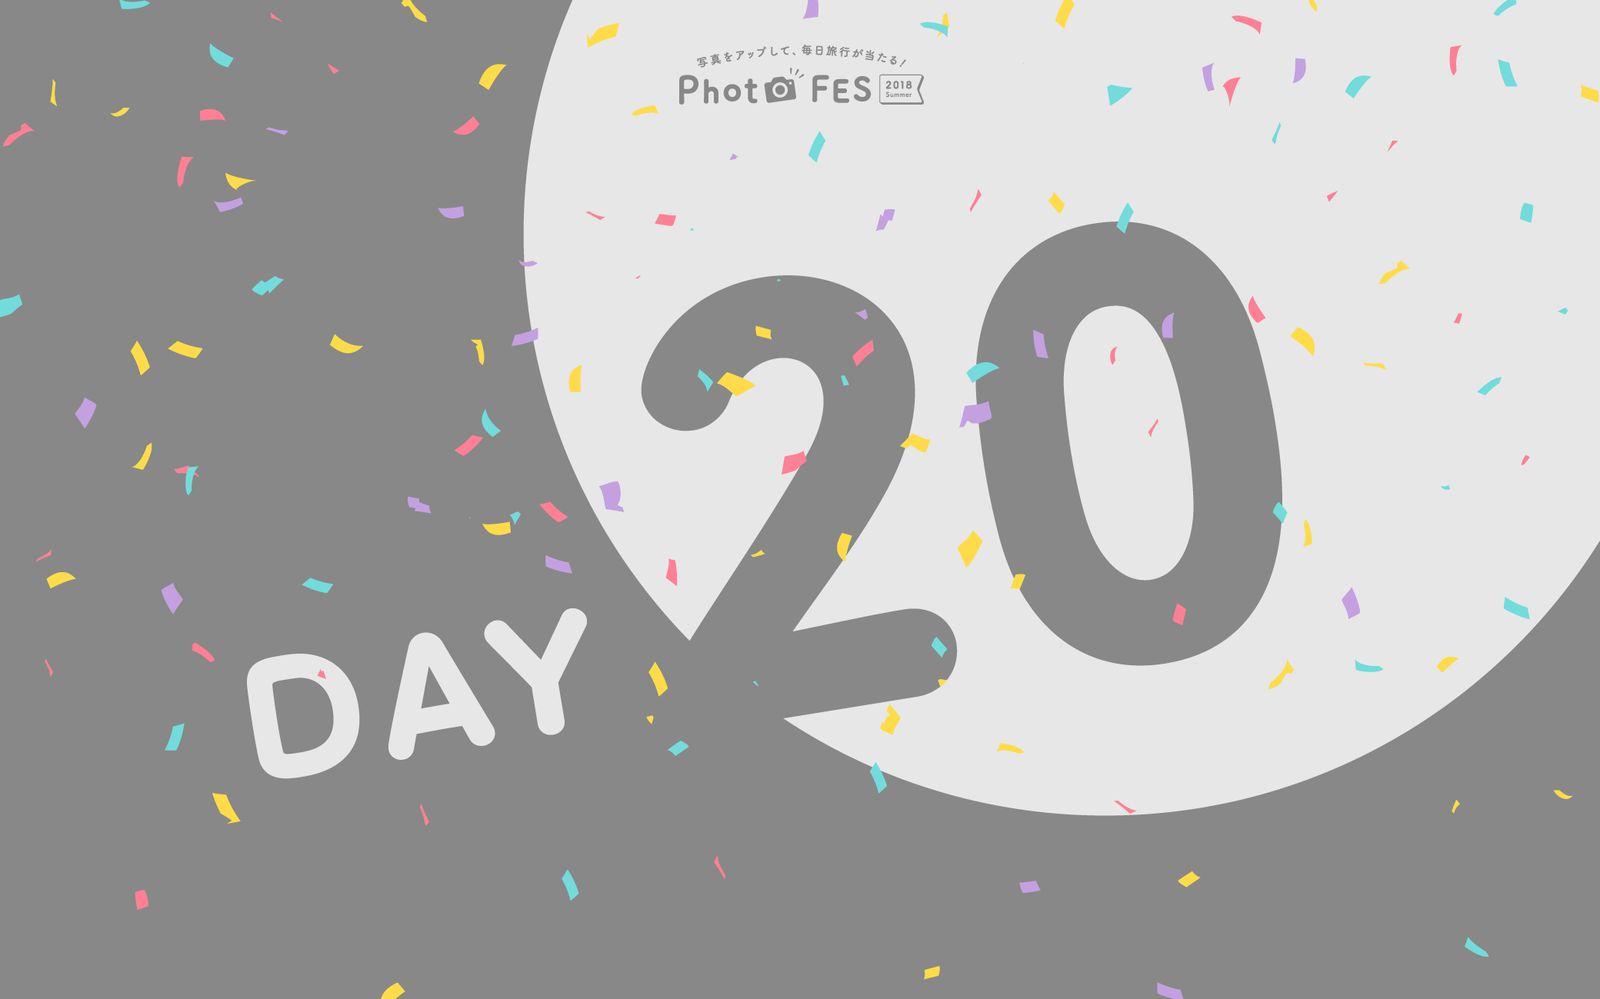 【DAY20】「Photo FES 2018」7月15日投稿分であたる賞品&受賞者発表